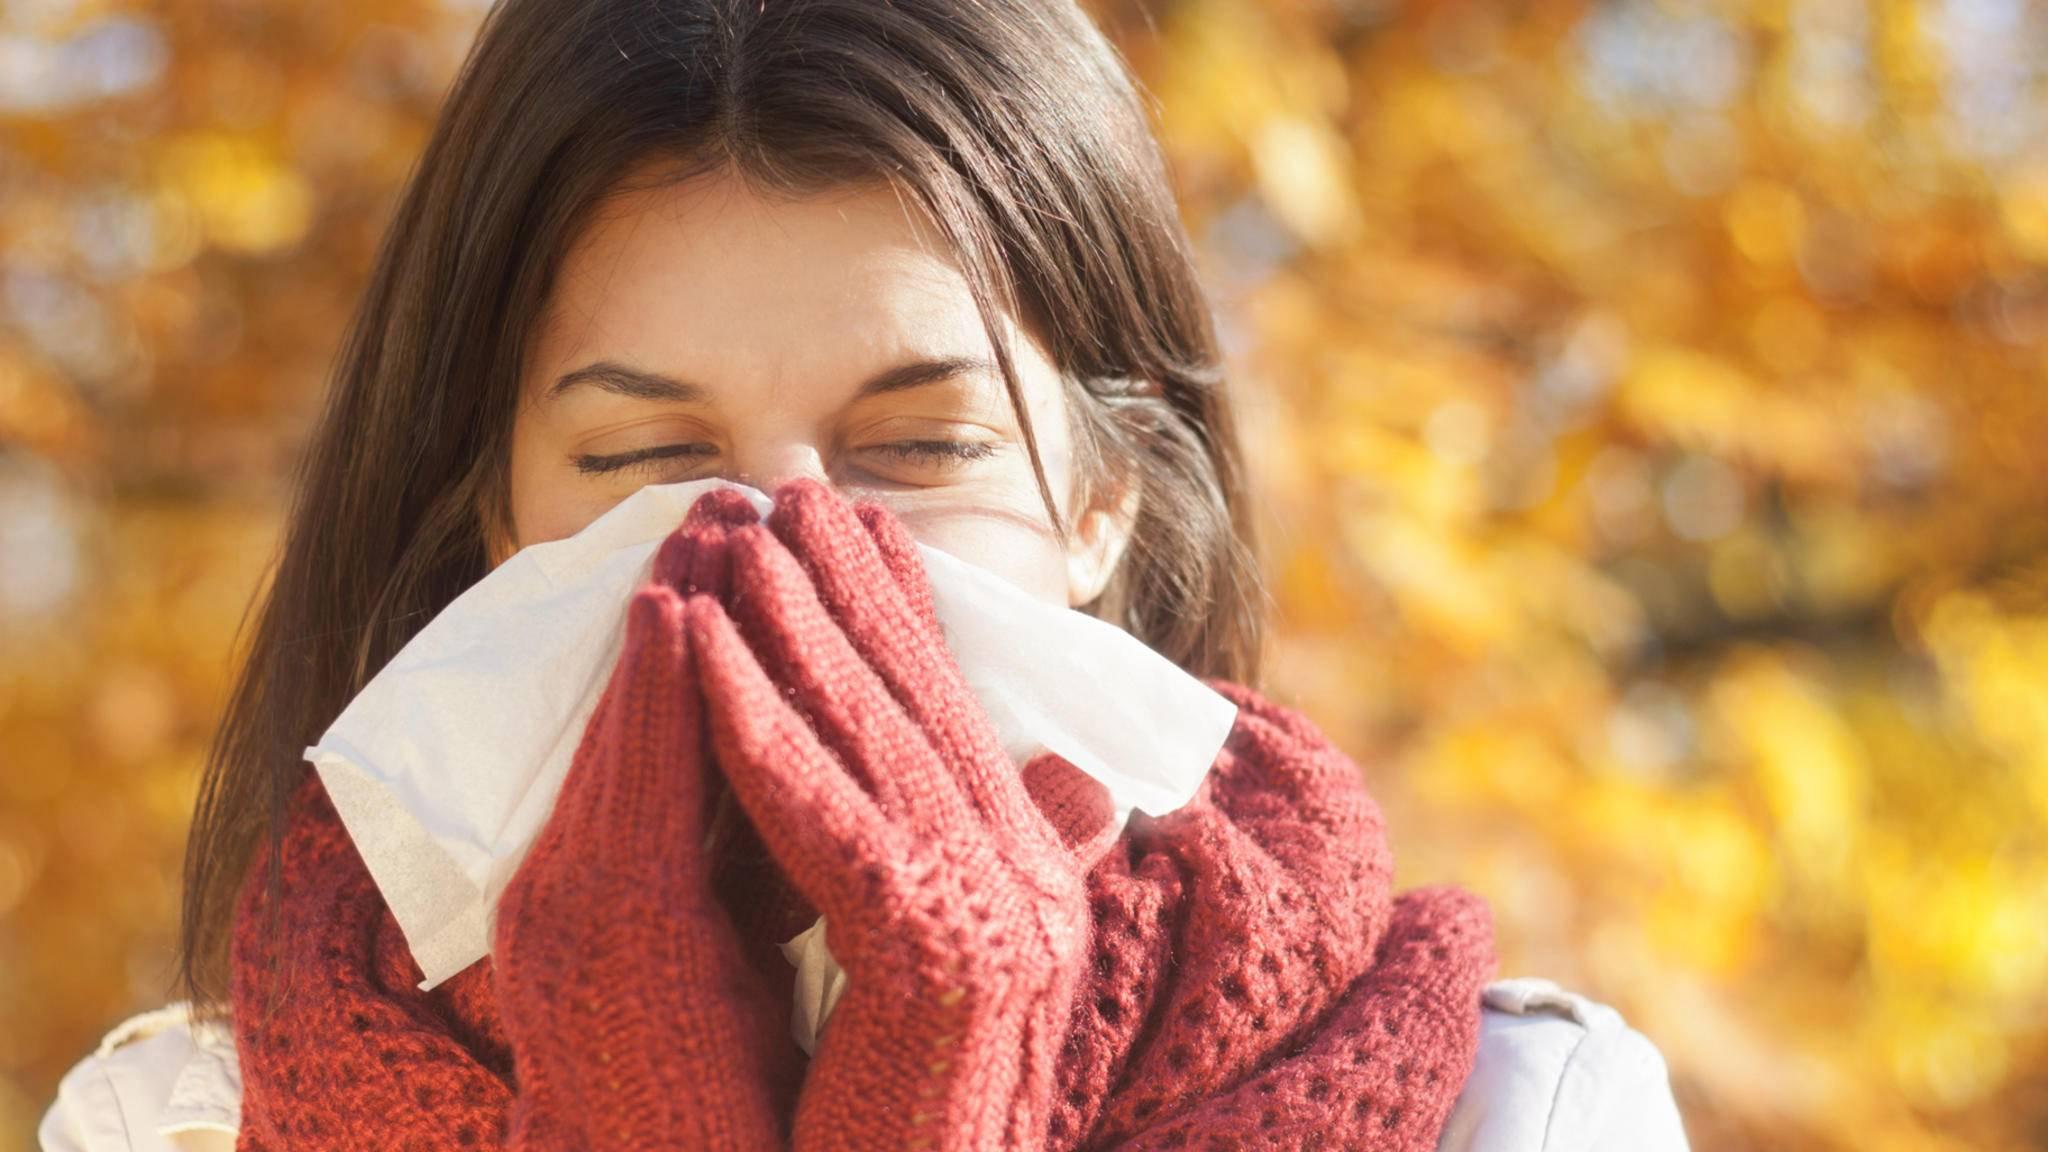 Erkältungsmittel können nicht vor grippalen Infekten schützen.